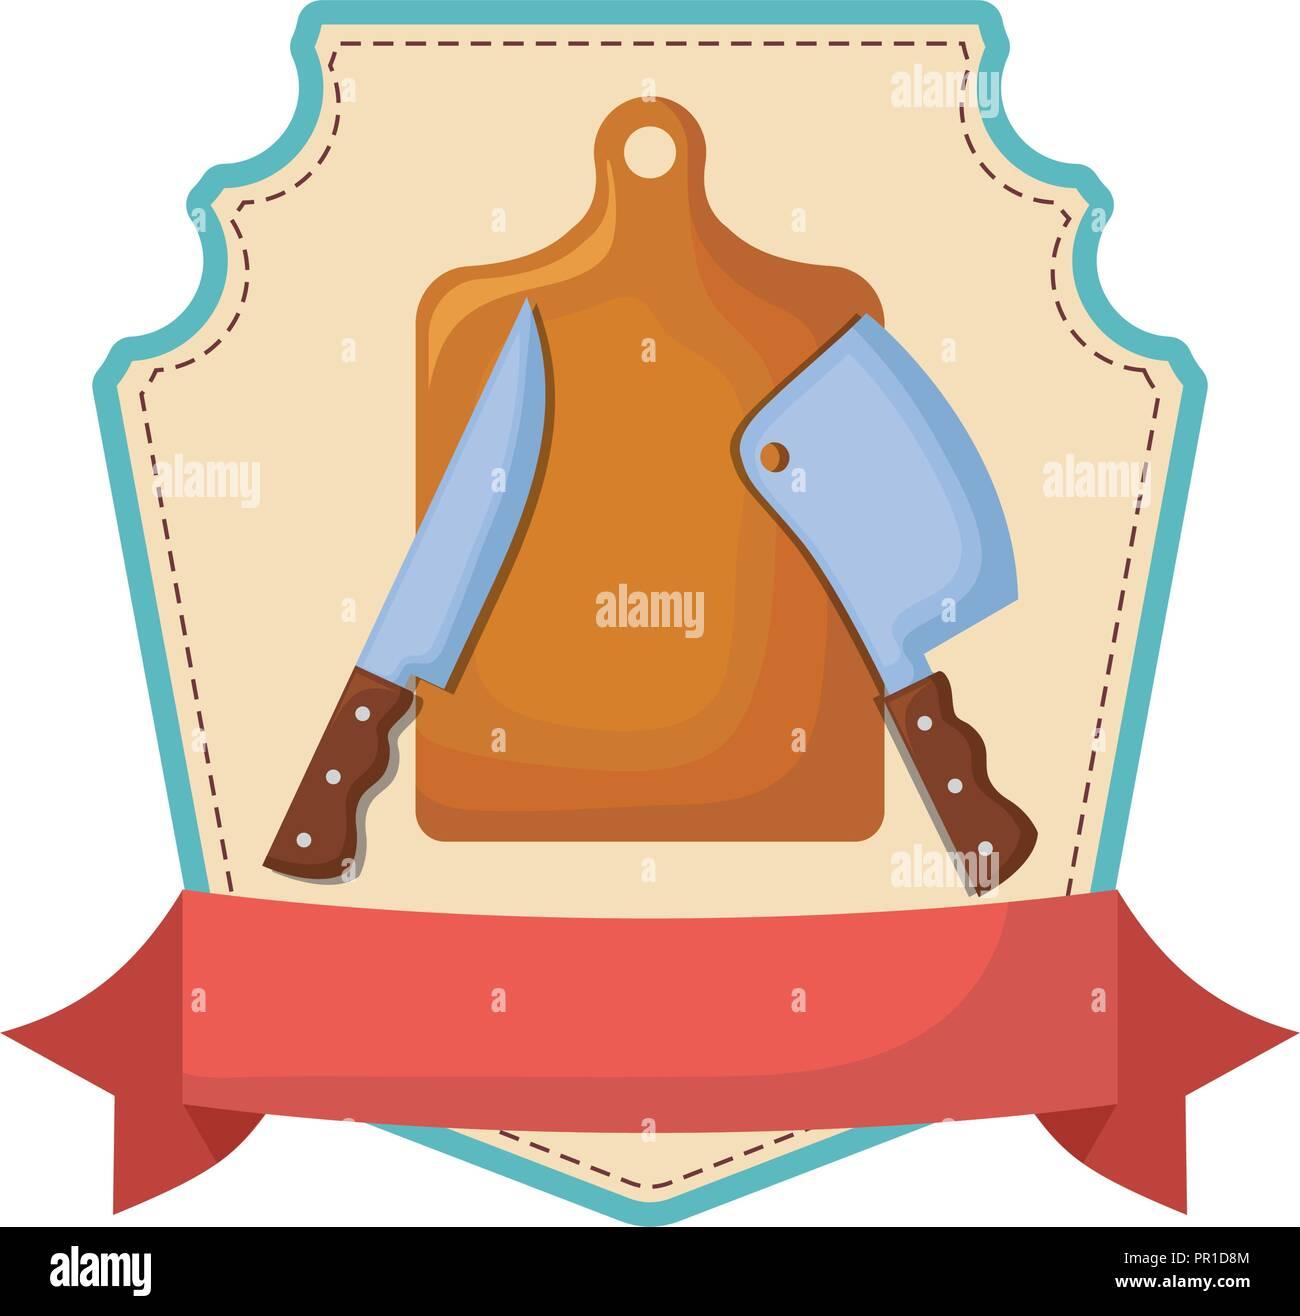 kitchen knifes and cutting board banner emblem vector illustration - Stock Image